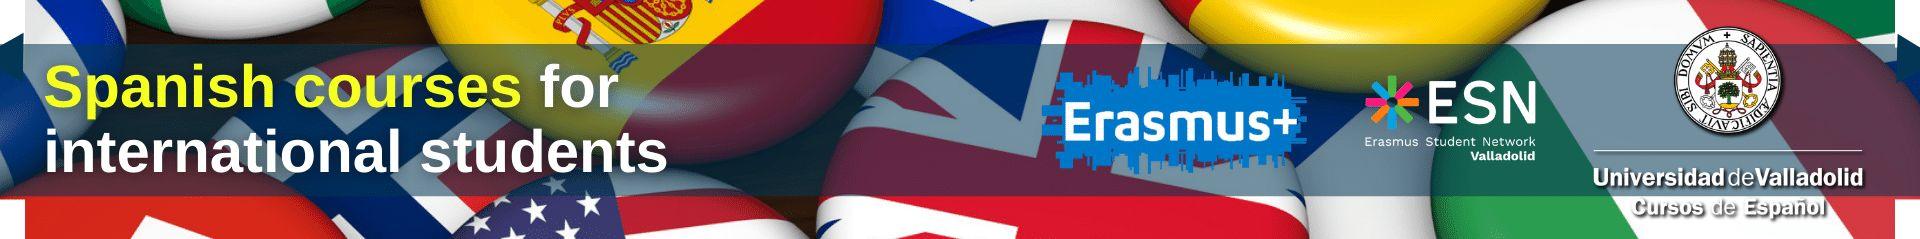 Banner Spanish Courses for international Erasmus students - University of Valladolid